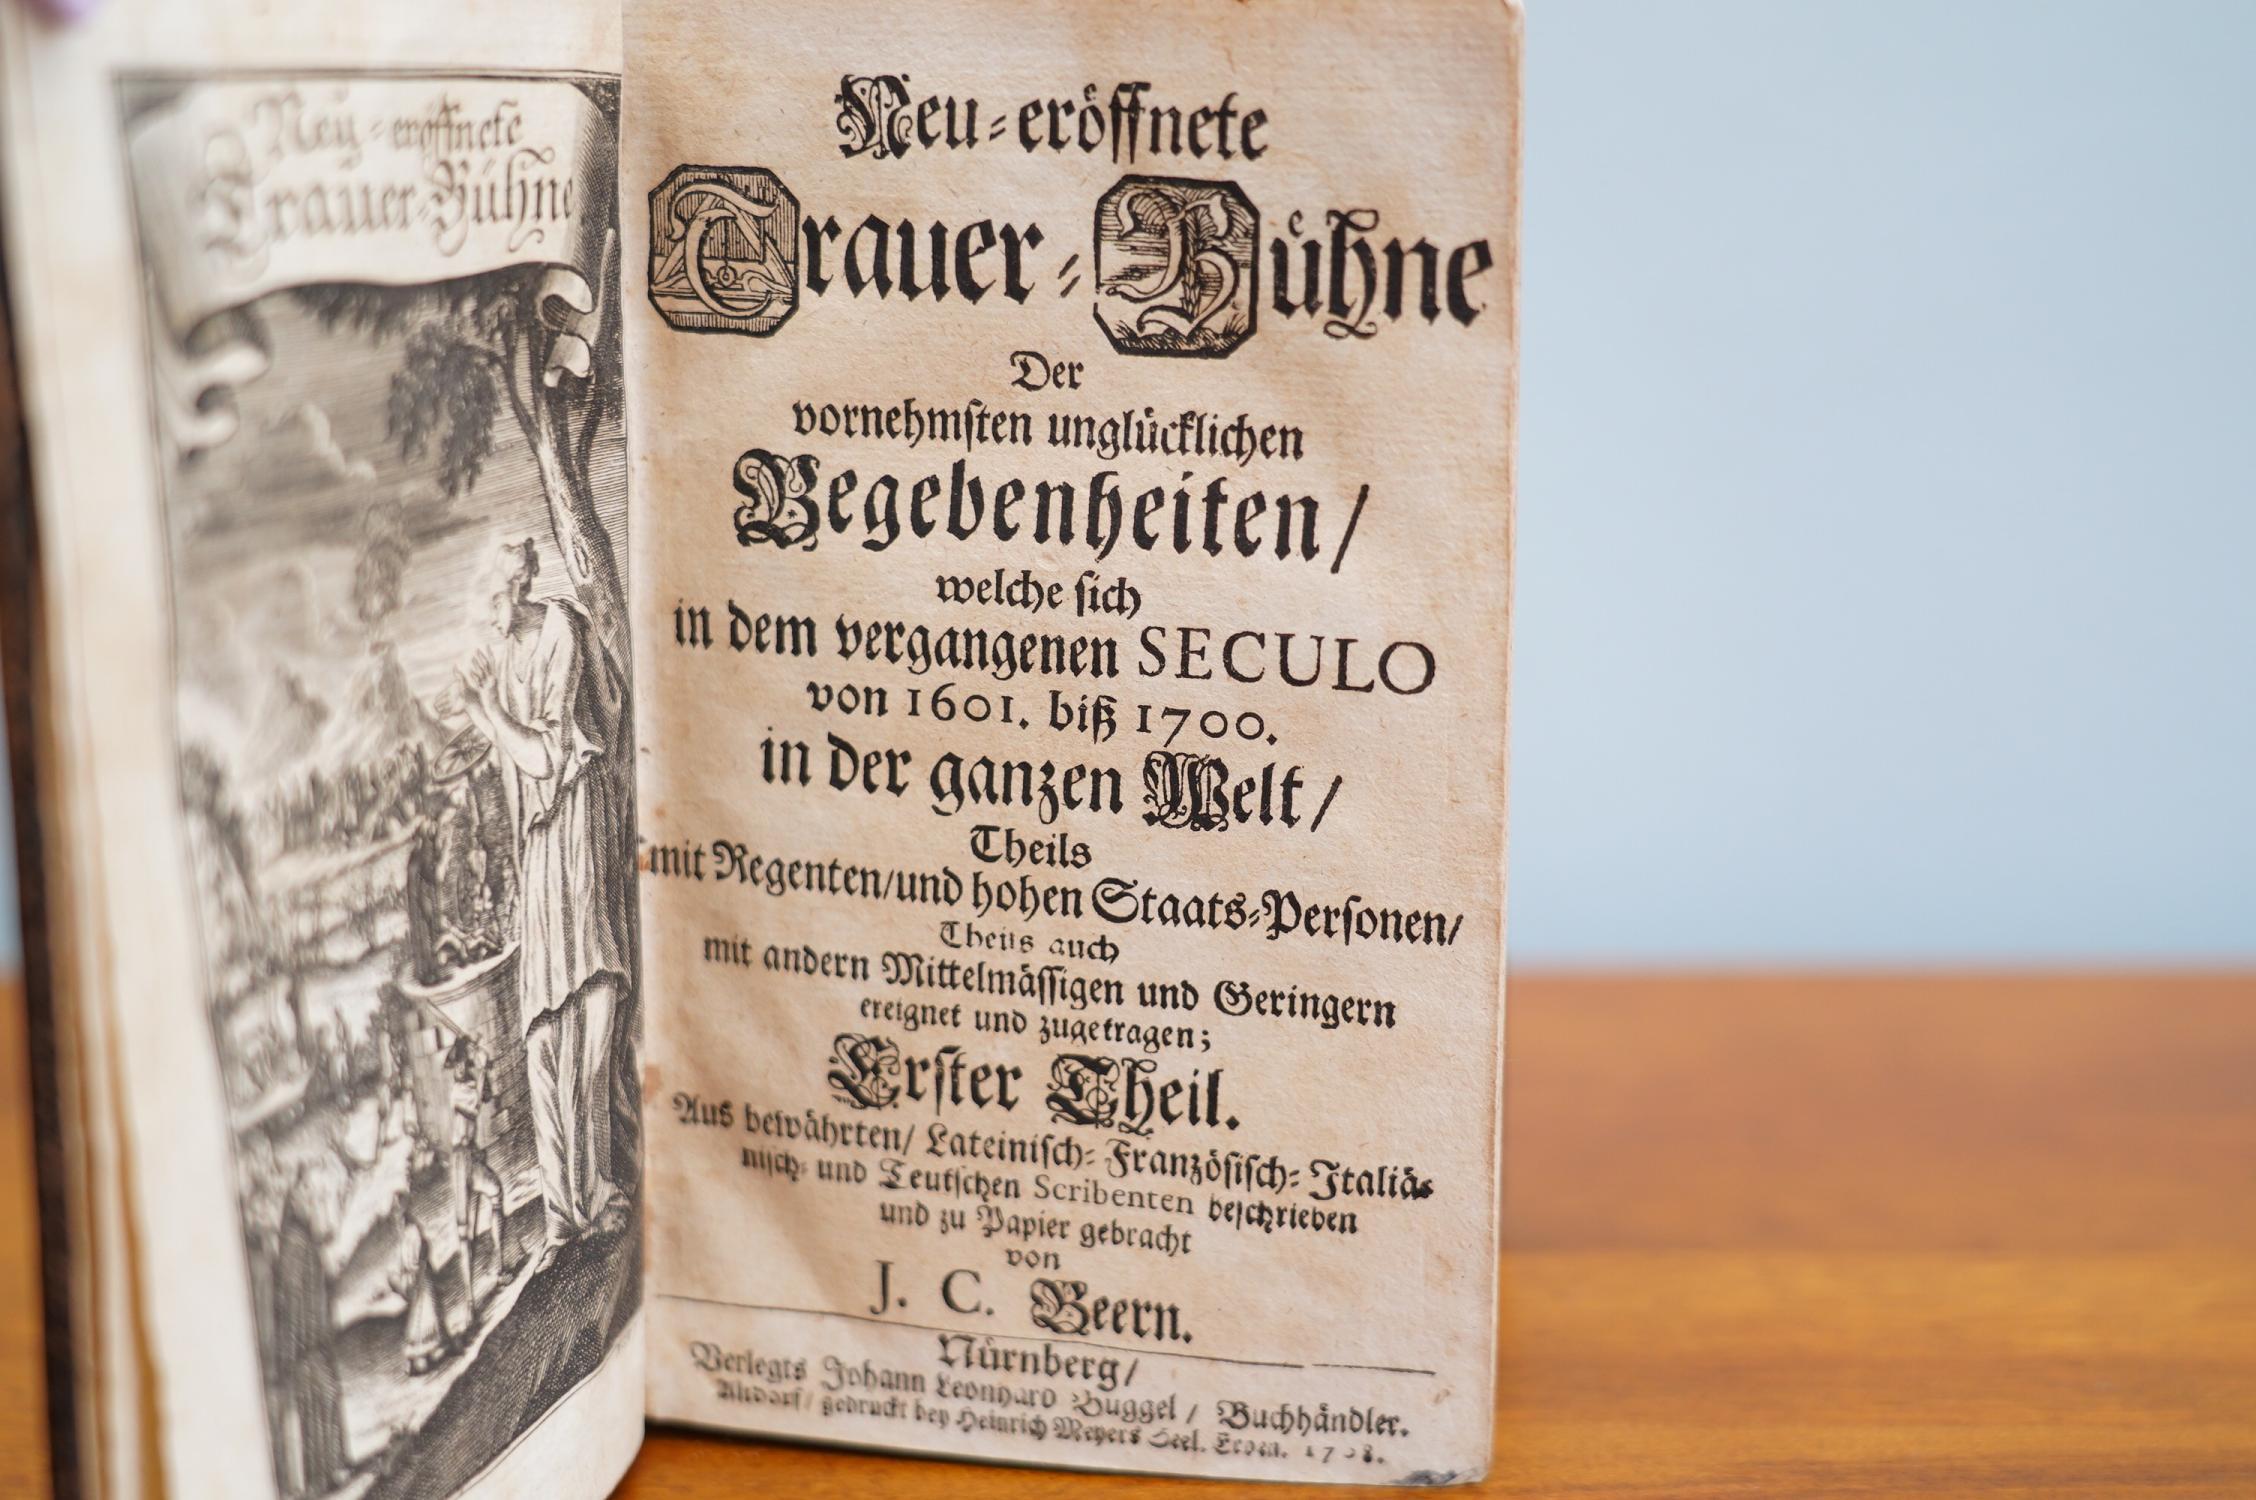 Neu-eröffnete Trauer-Bühne: Johann Christoph Beer